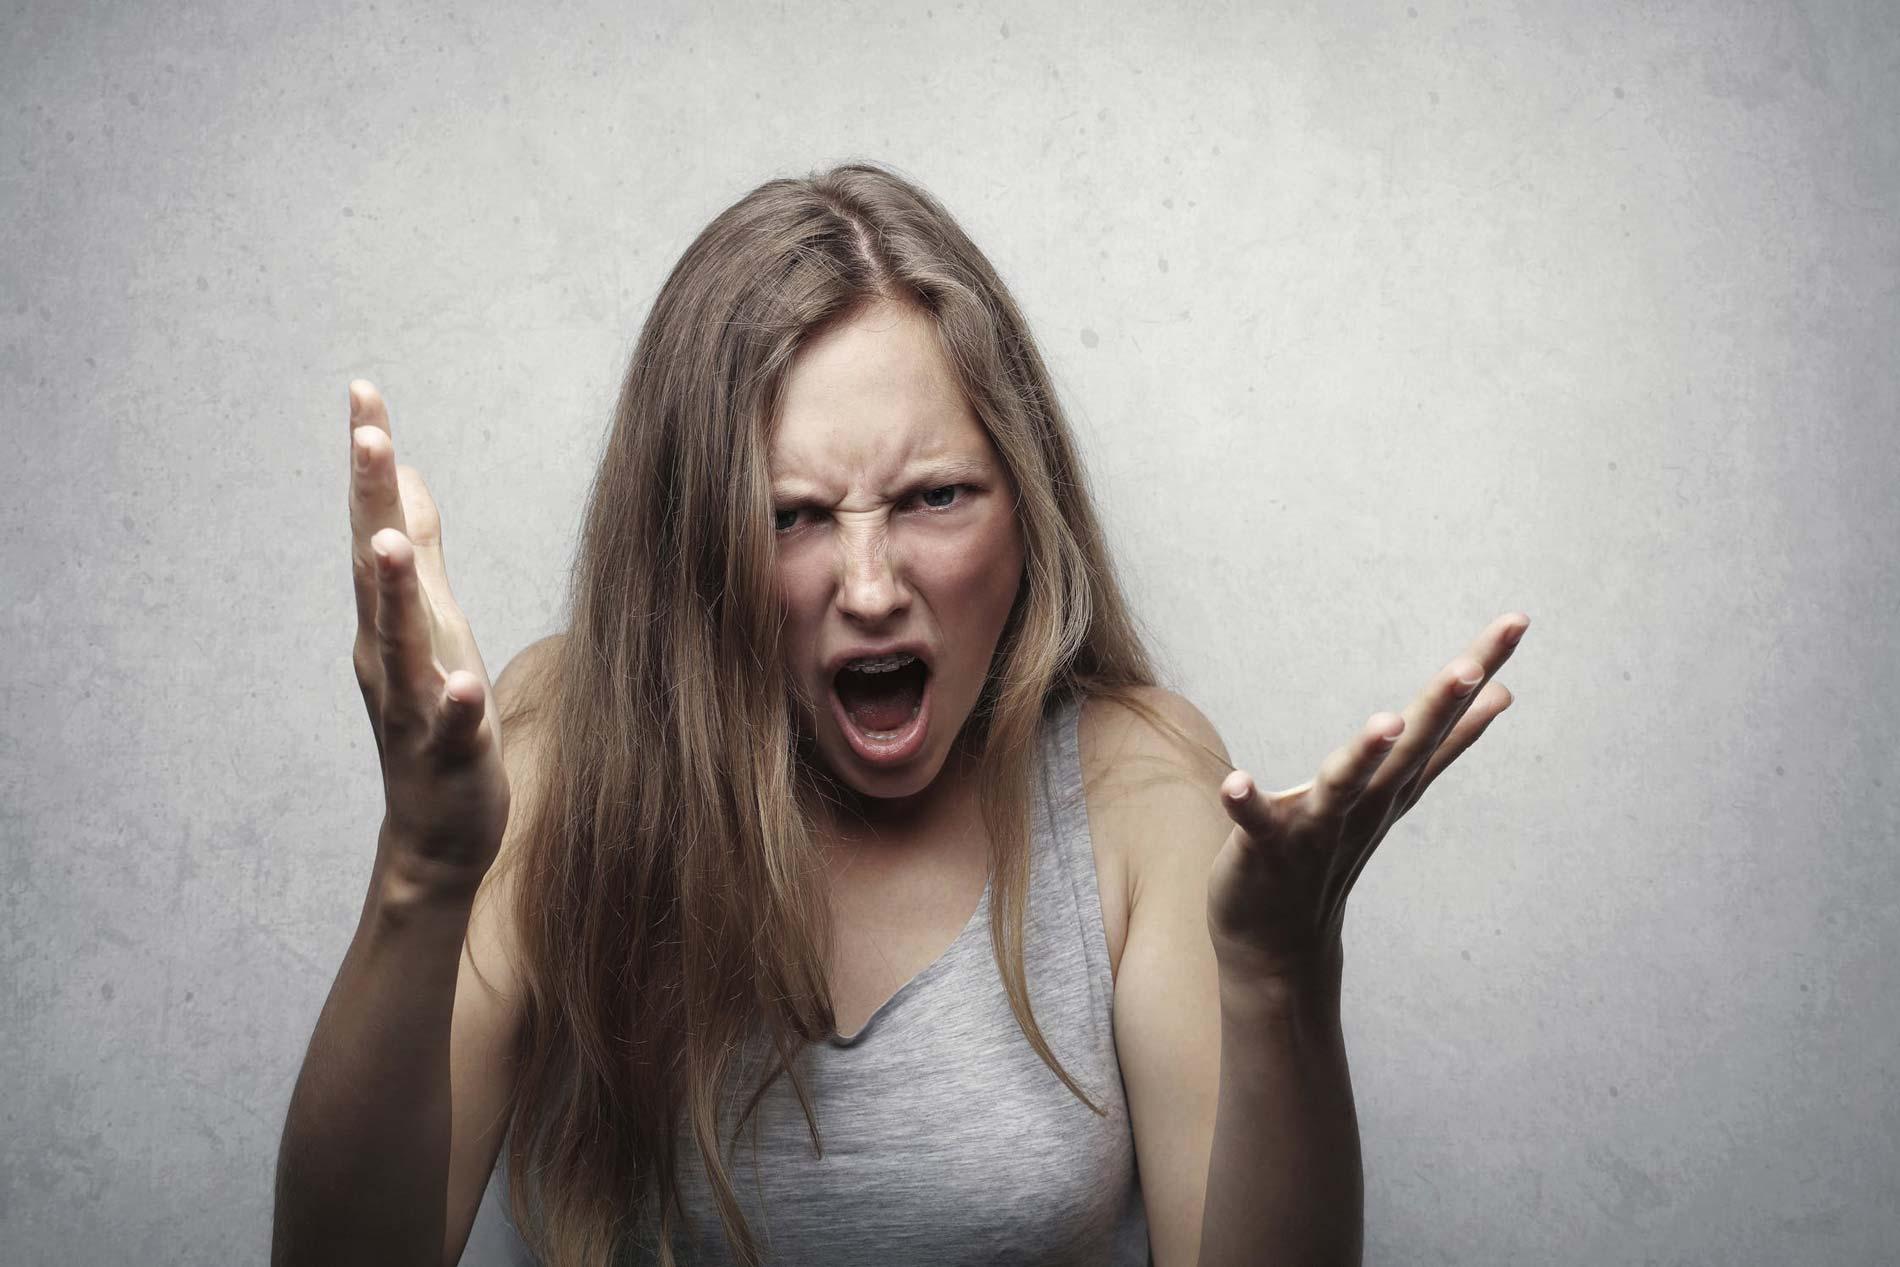 Reseña de Libro: Controle su ira antes de que ella le controle a usted